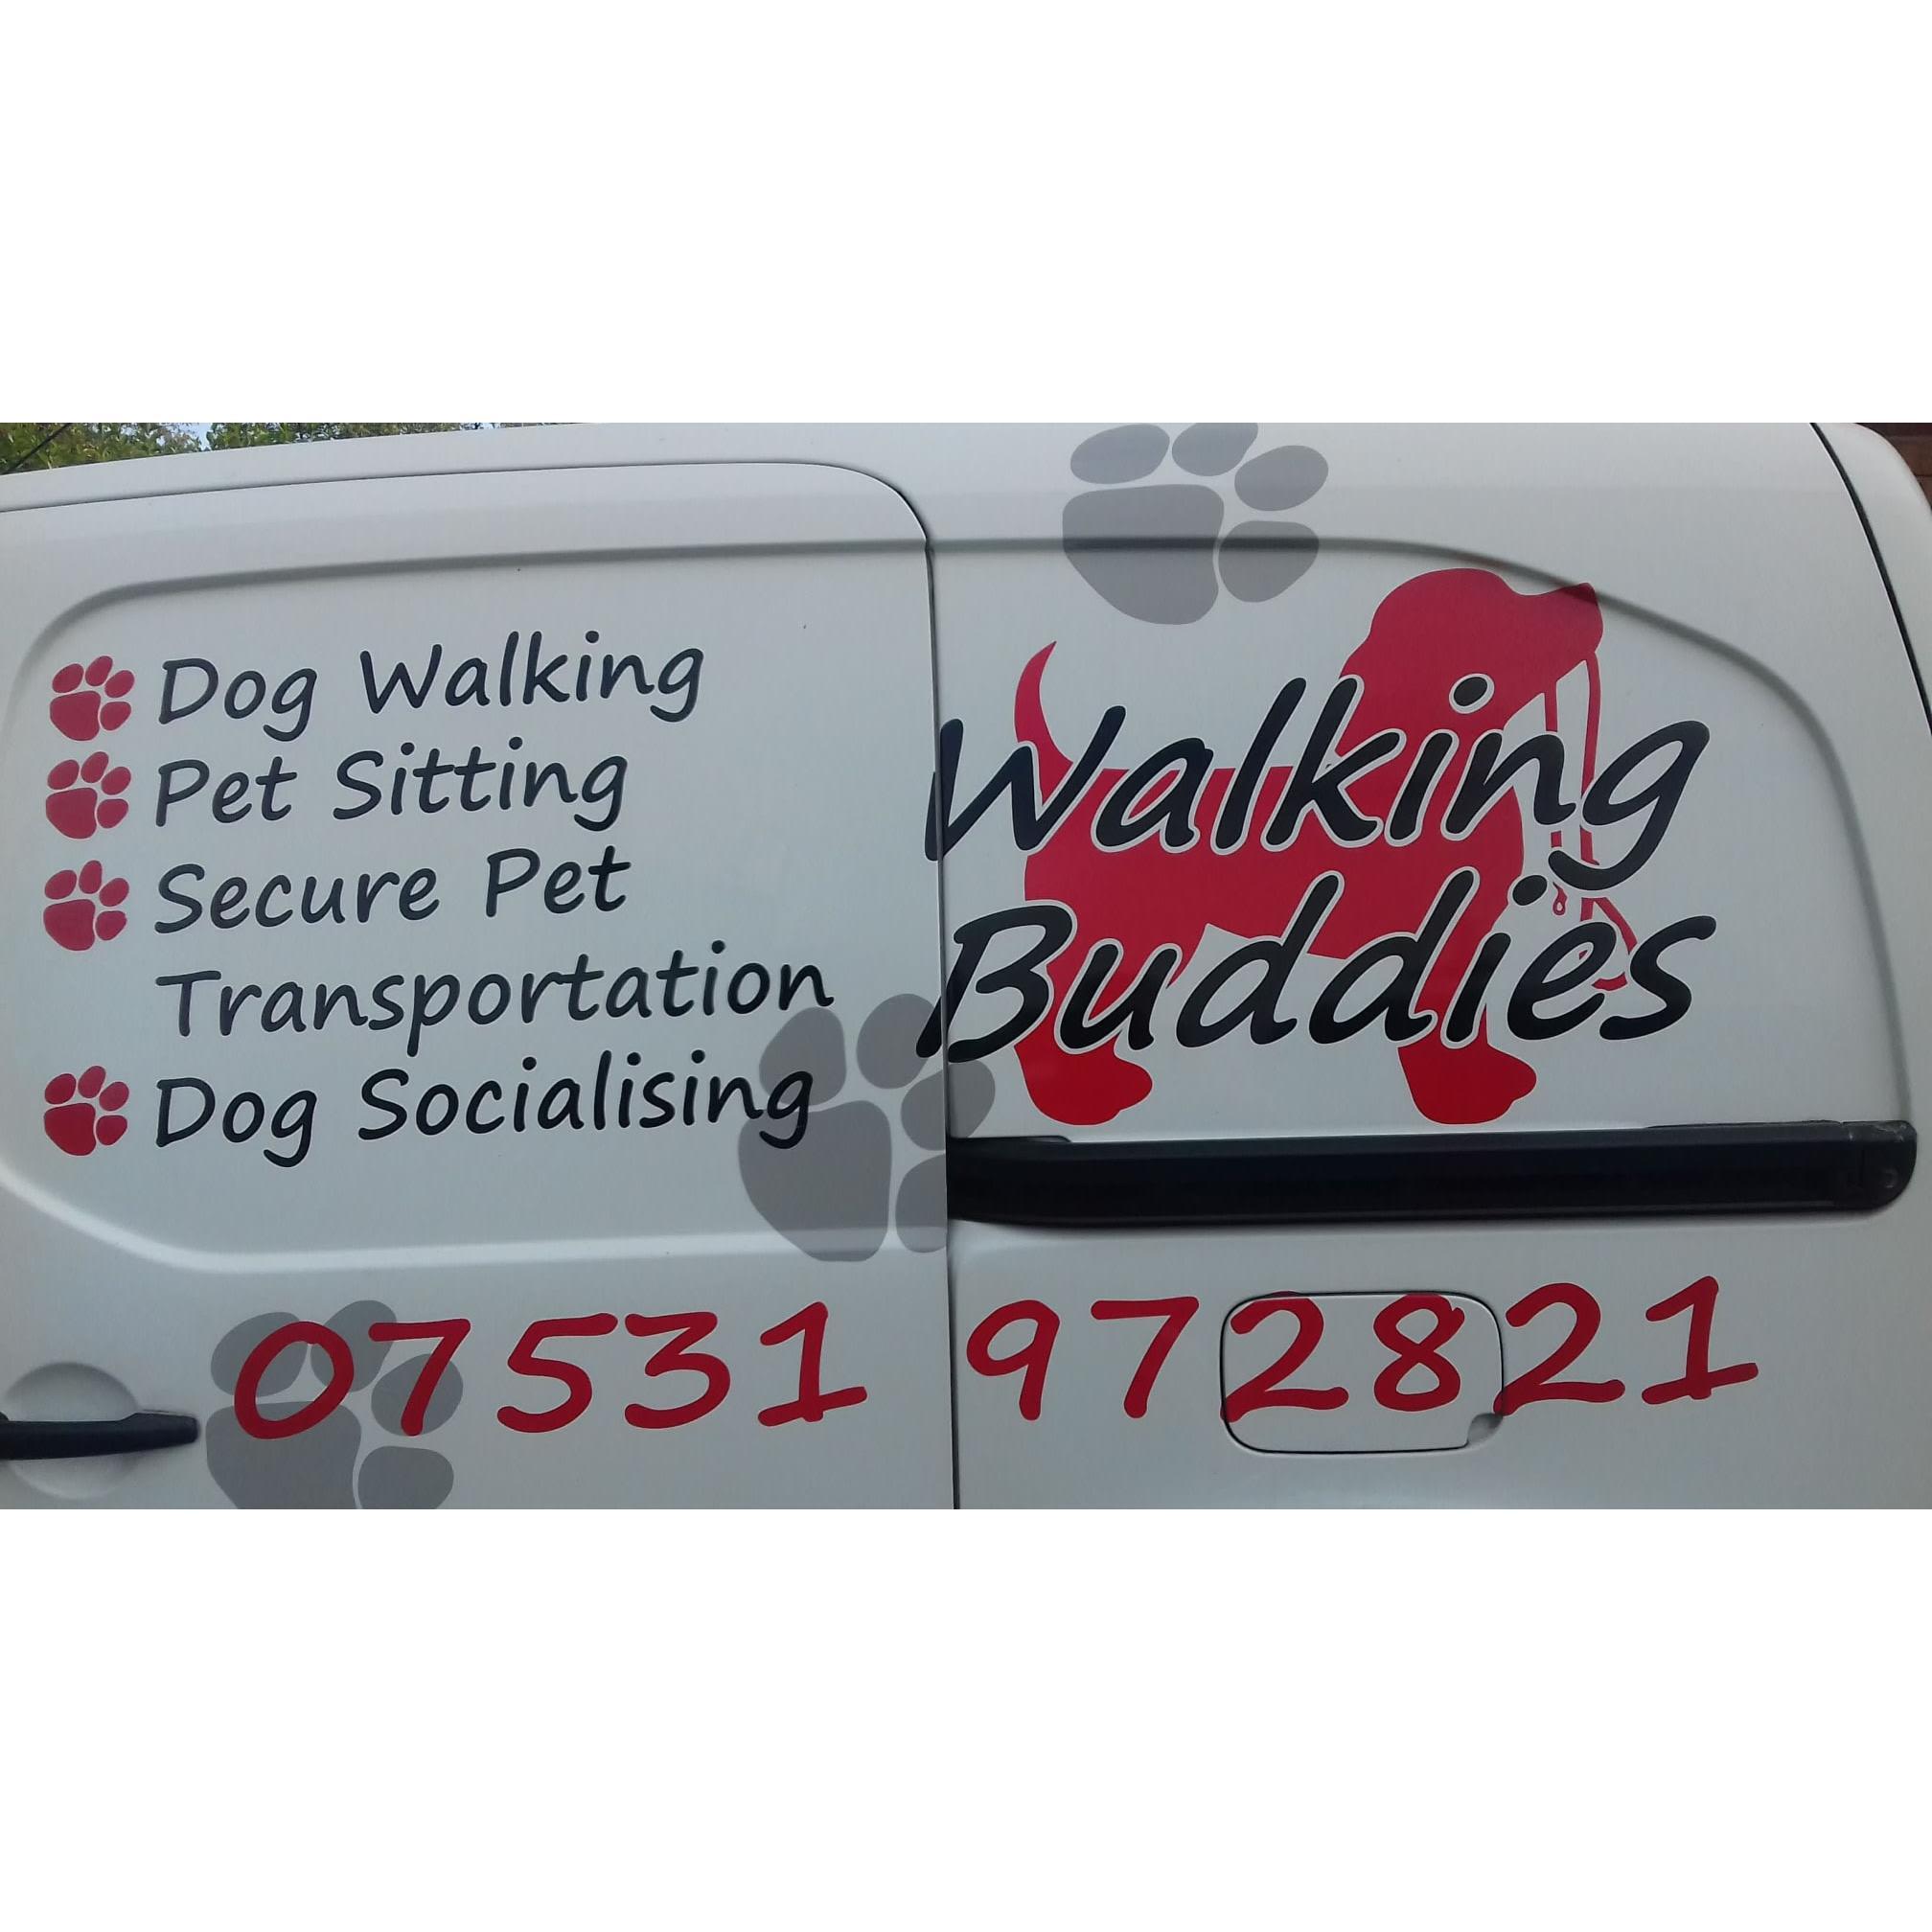 Walking Buddies - Manchester, Lancashire M22 5HA - 07531 972821 | ShowMeLocal.com